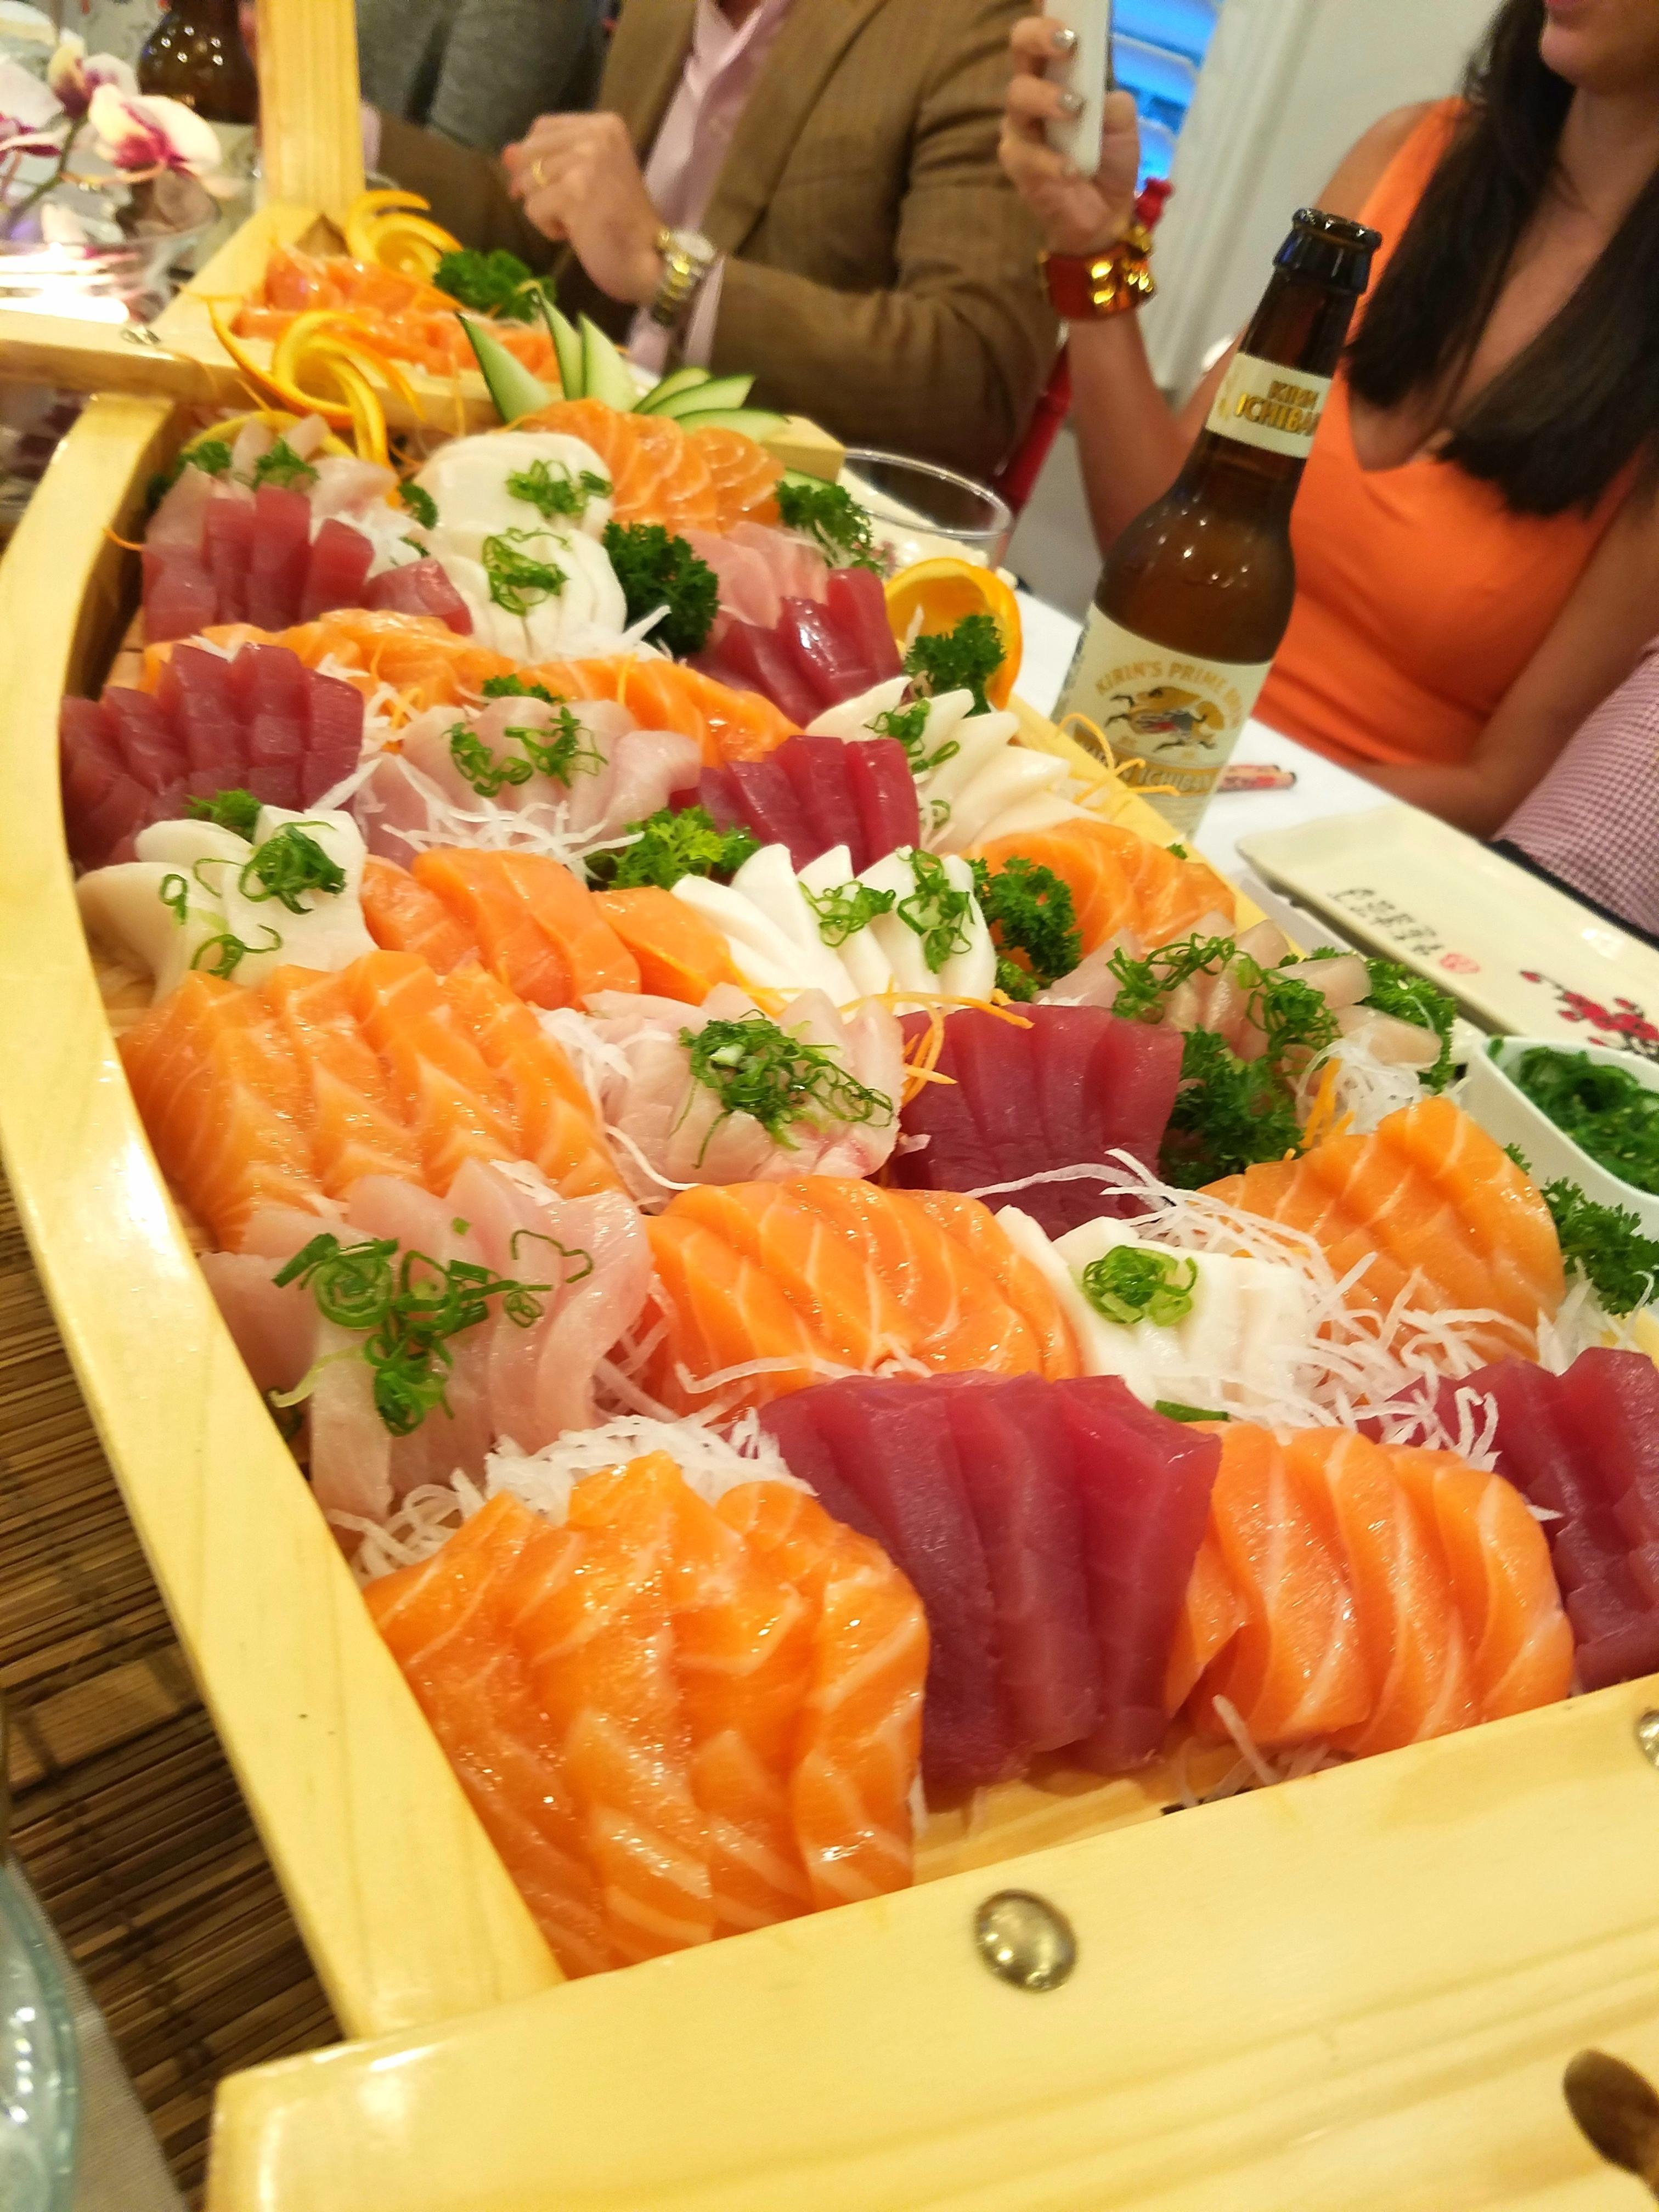 Armada Porn Video i ate] a sushi armada. #recipes #food #cooking #delicious